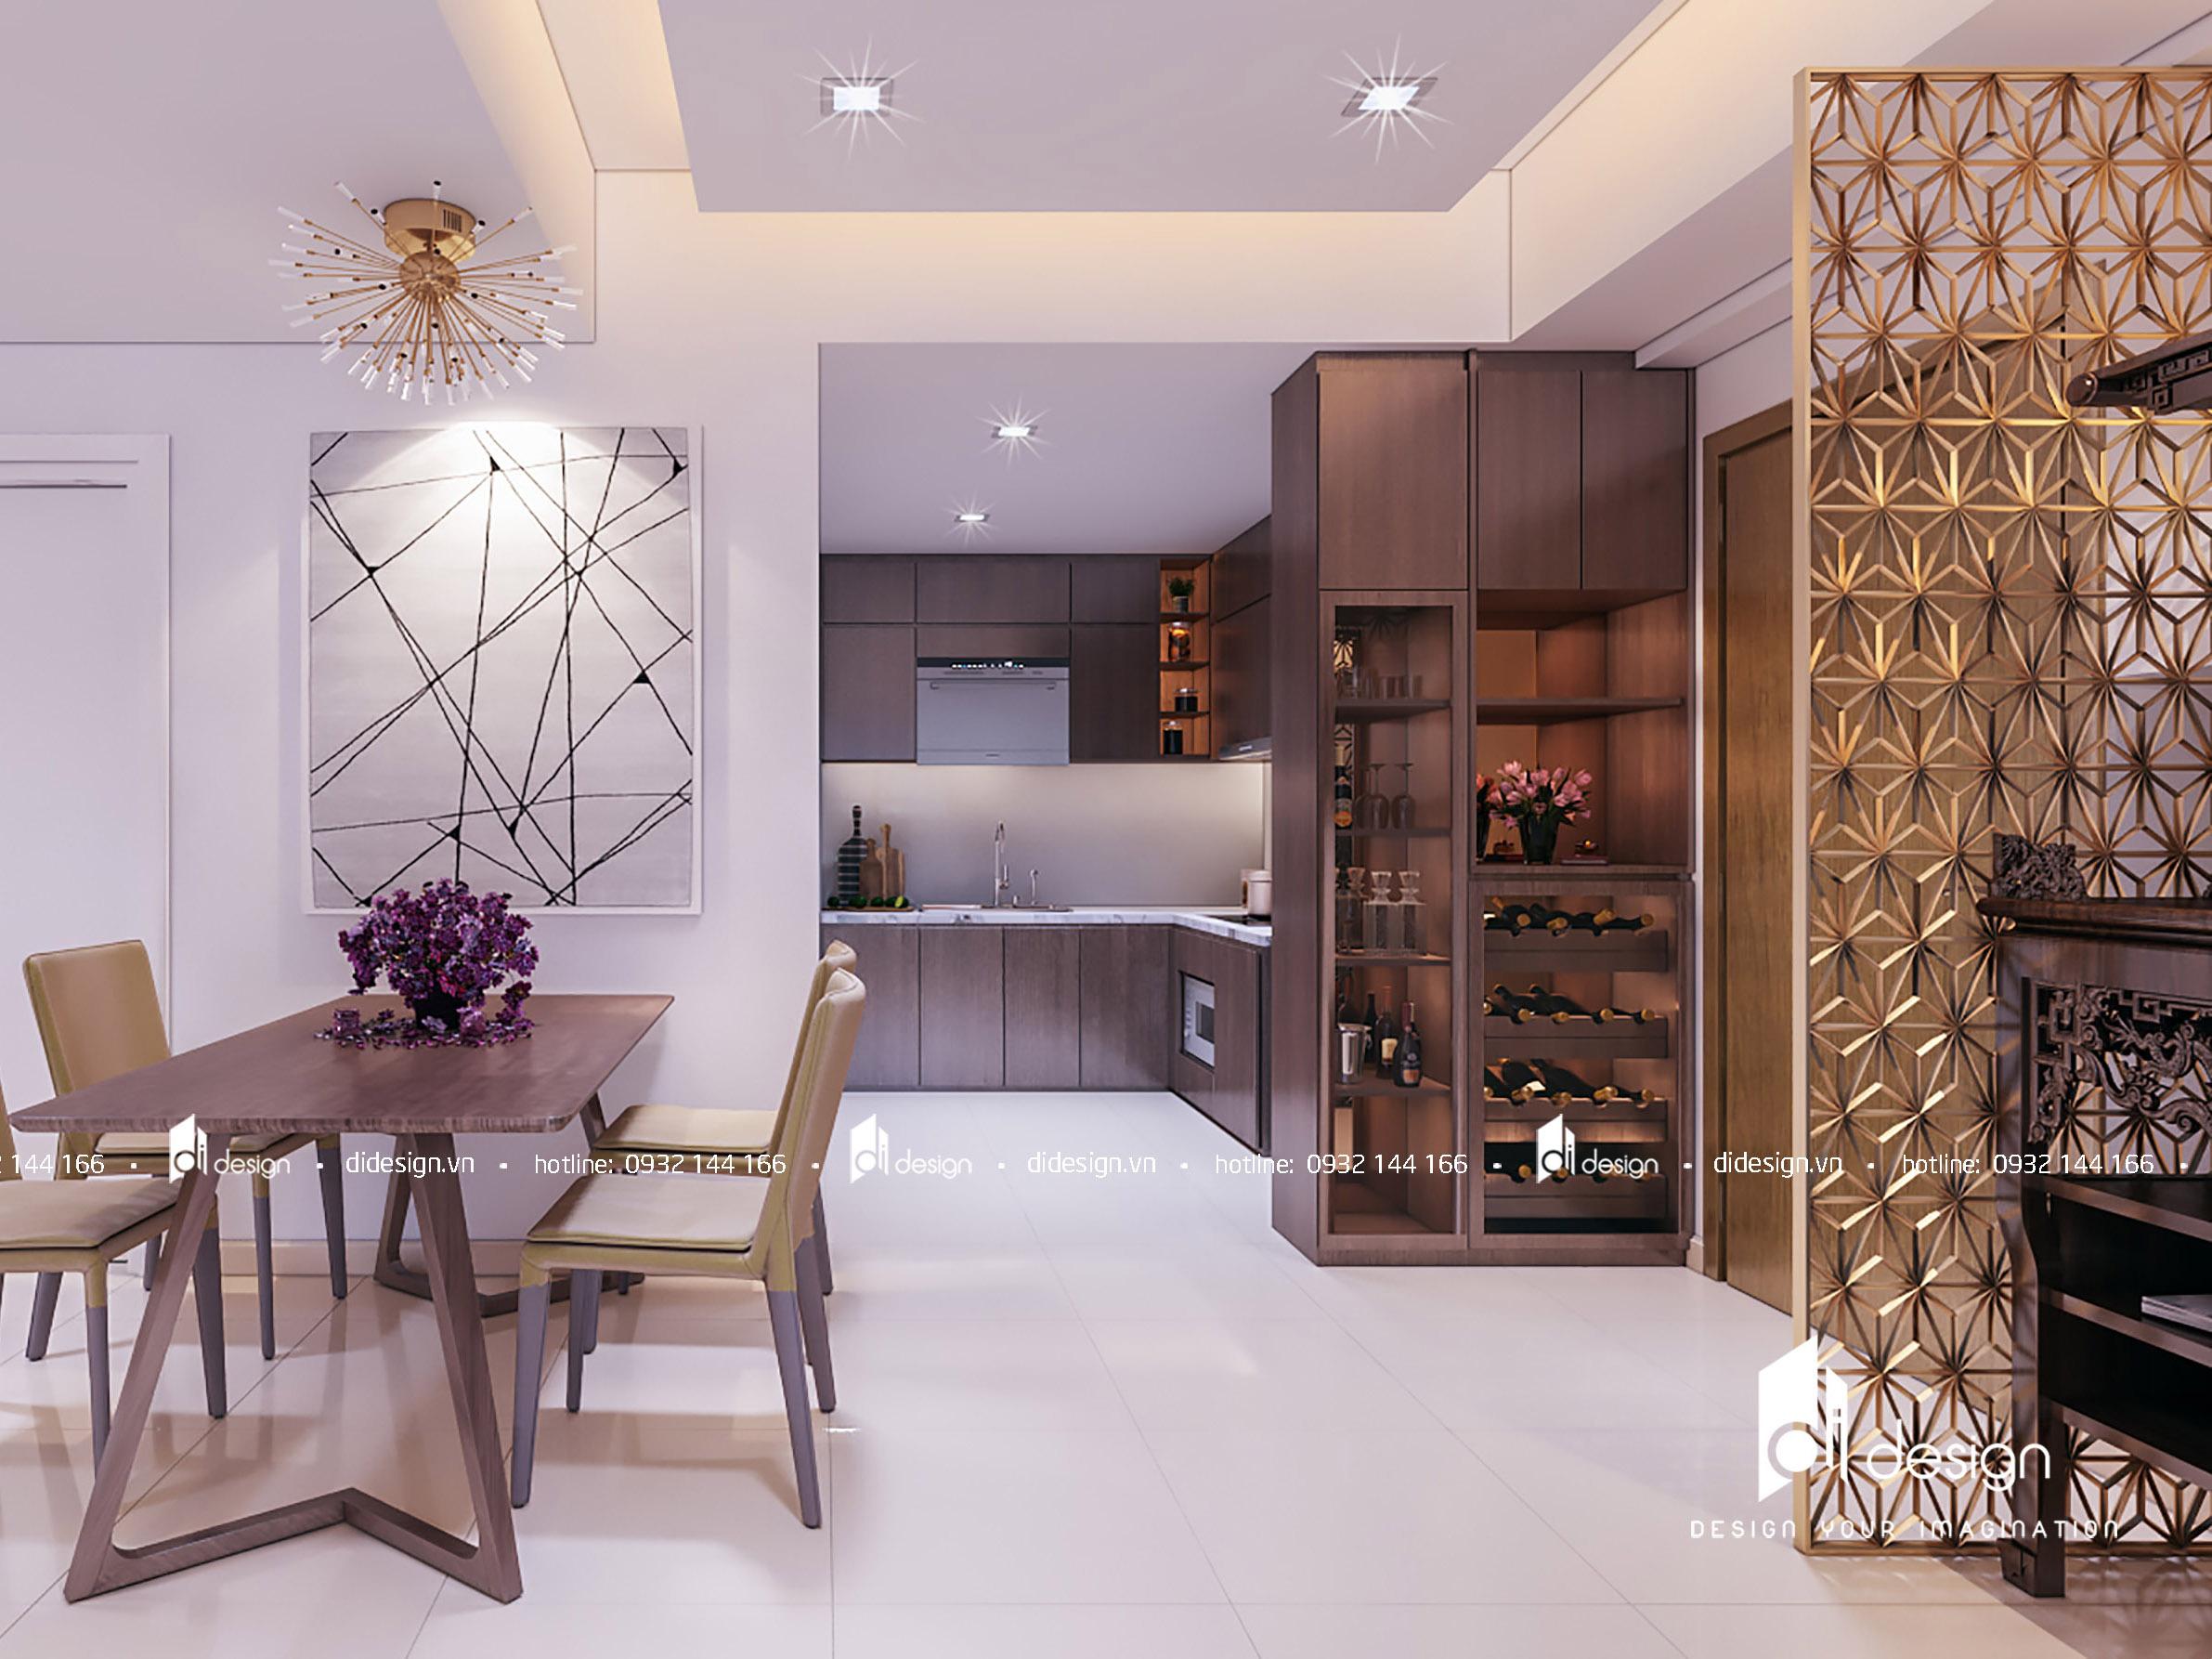 Thiết kế nội thất căn hộ Masteri Milennium 86m2